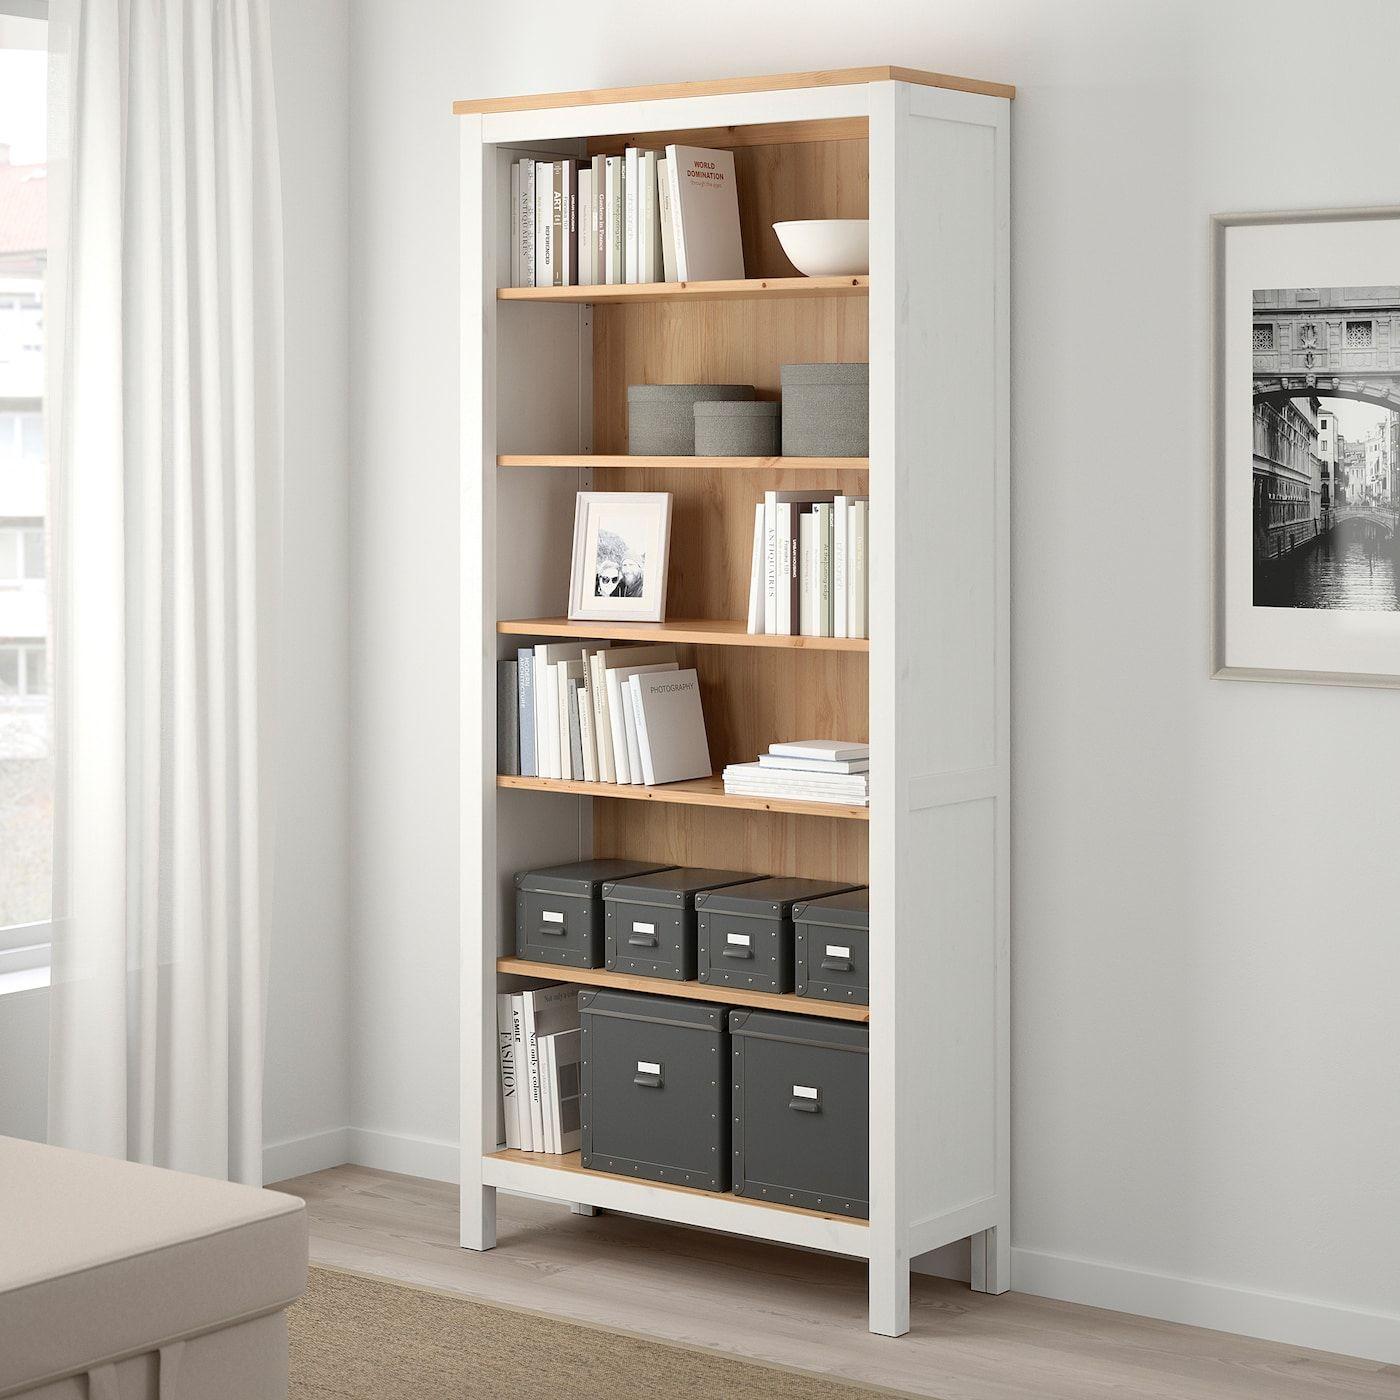 Ikea Kommode Braun 2021